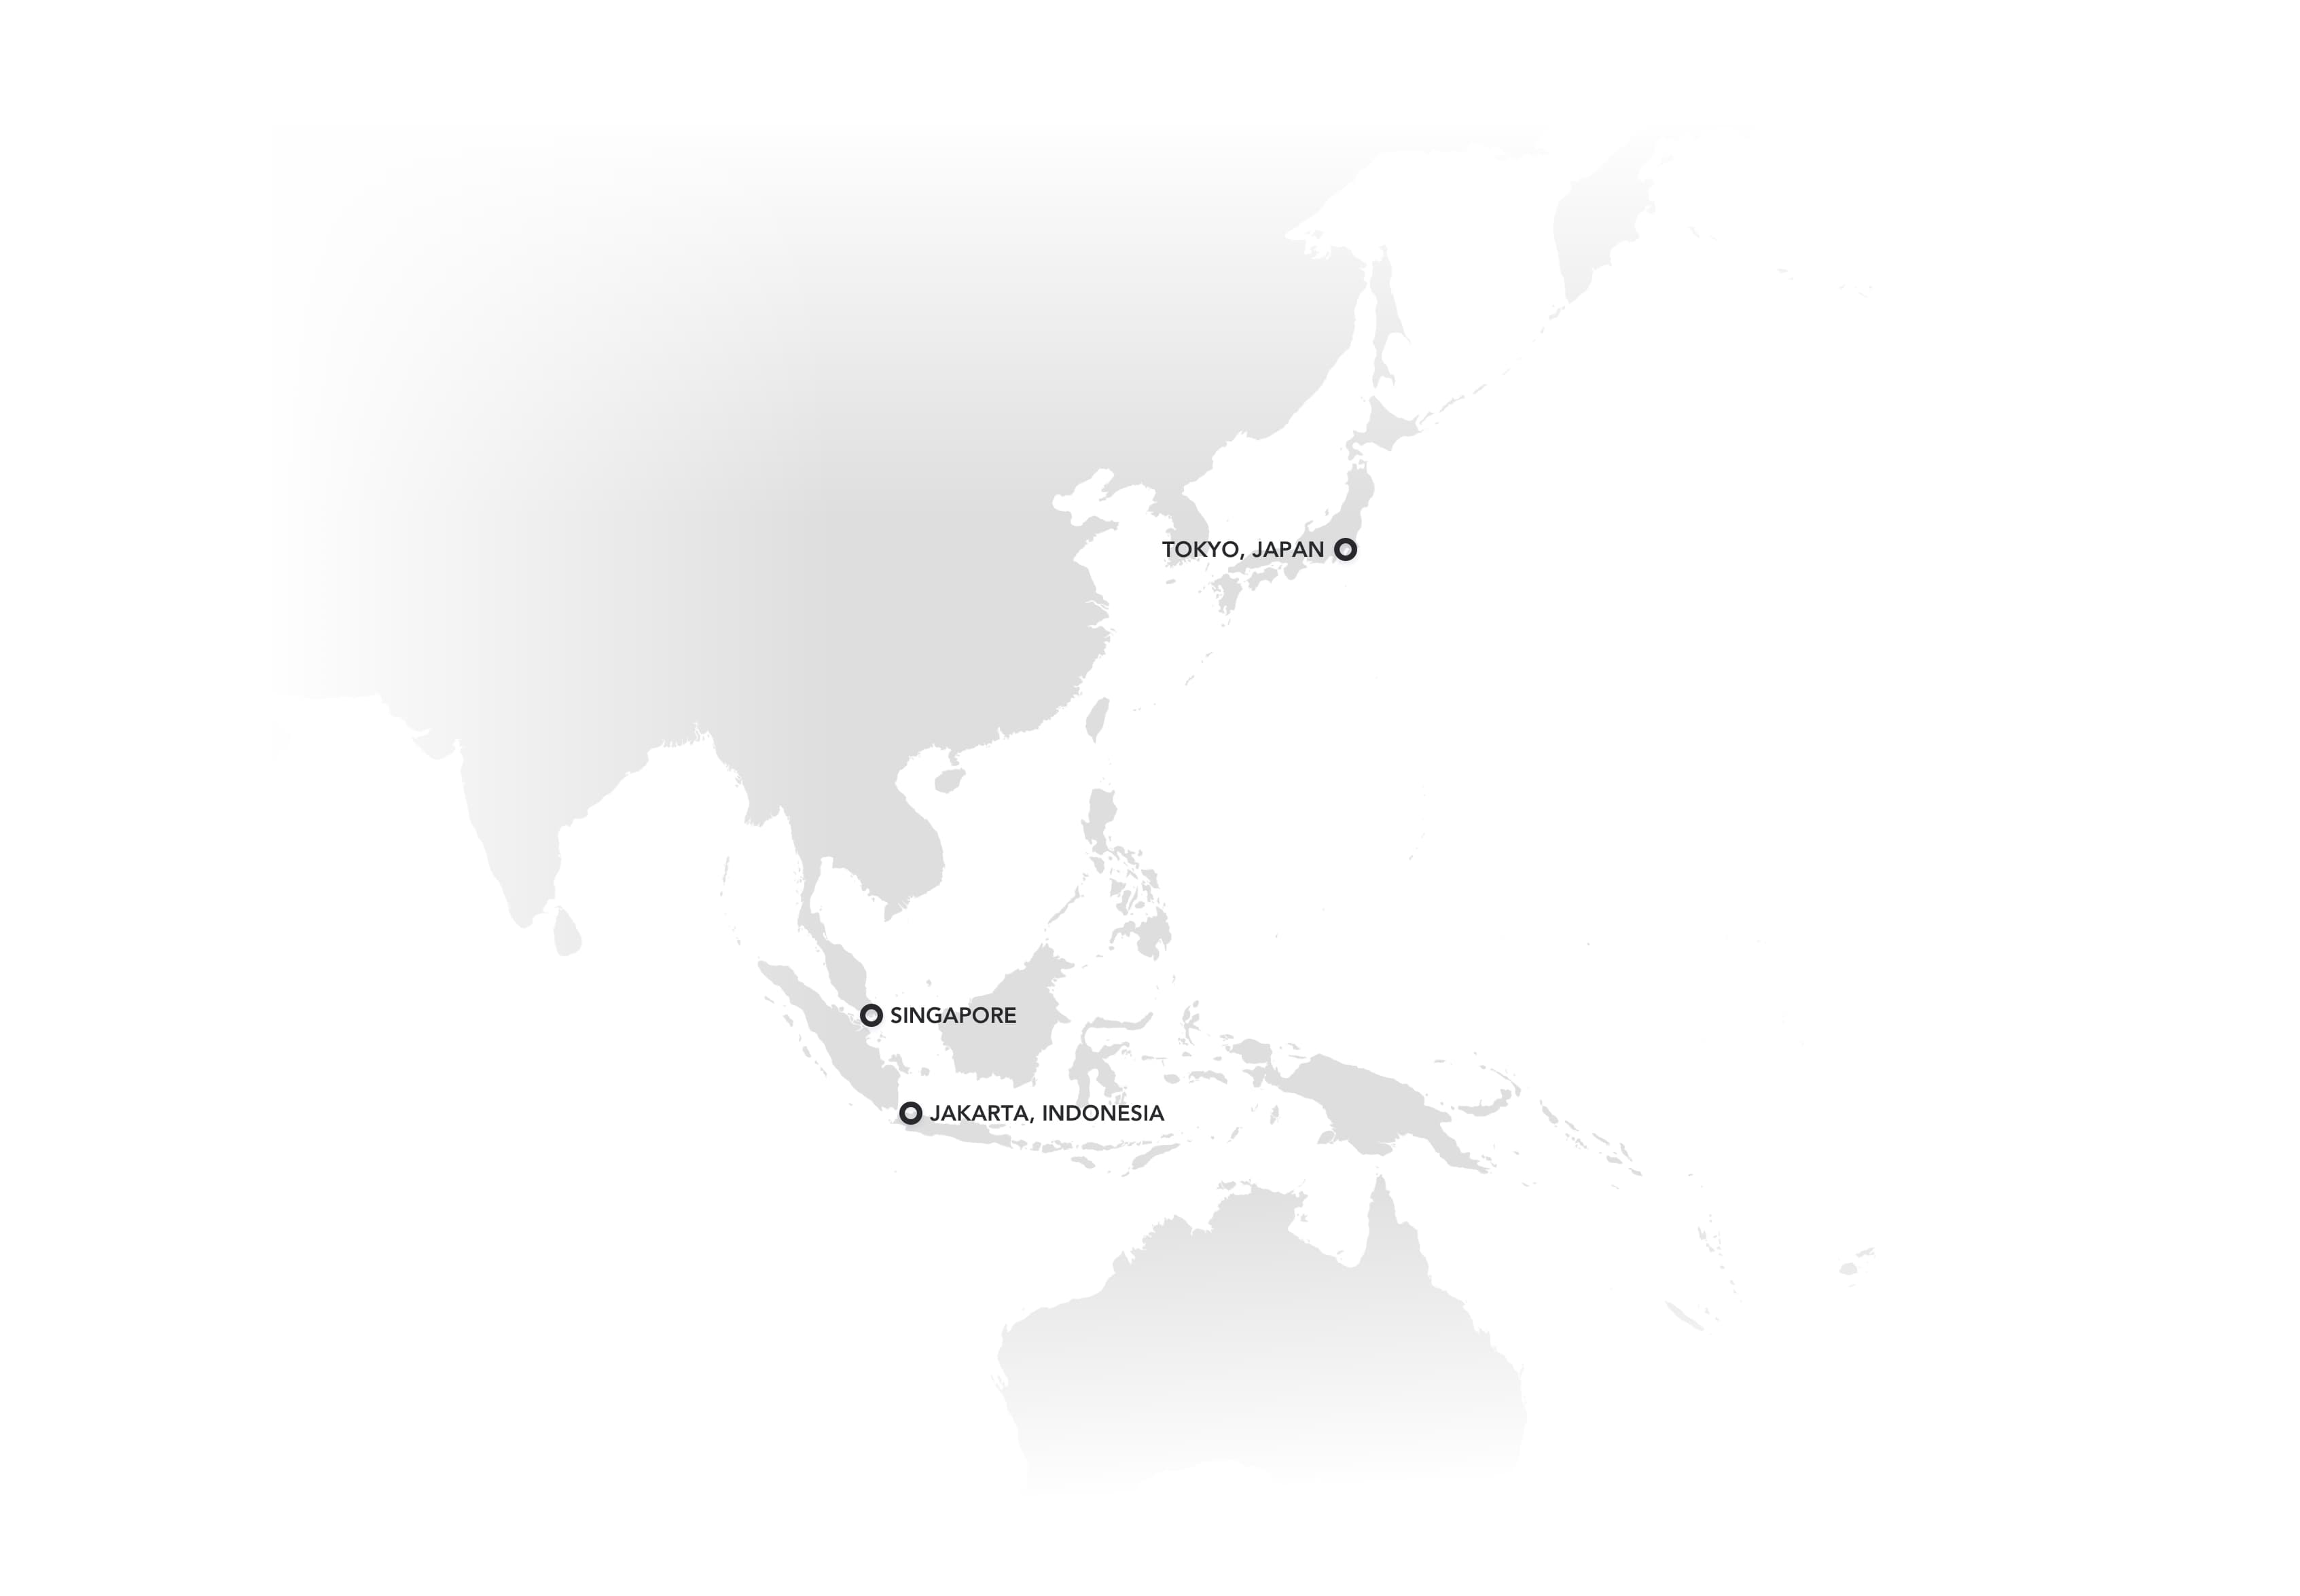 adgo-company-headquarters-map